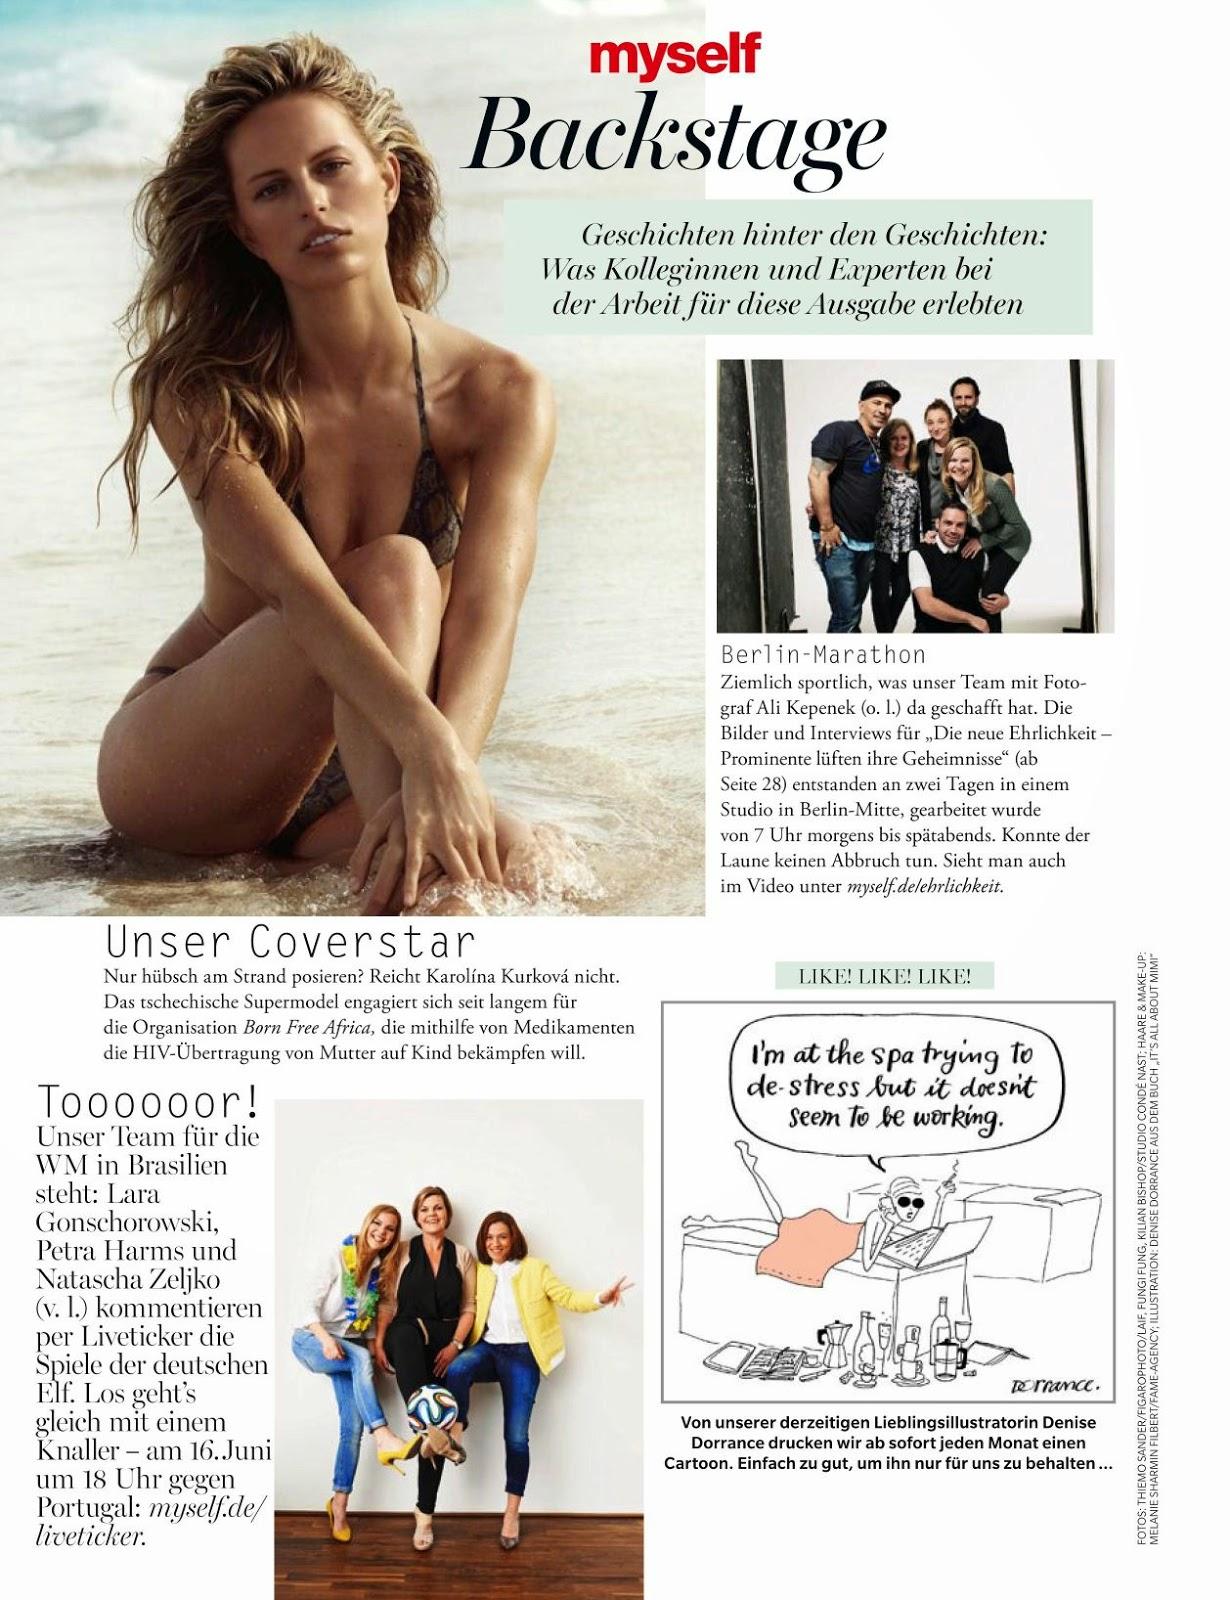 Karolina Kurkova For Myself Magazine, Germany, July 2014